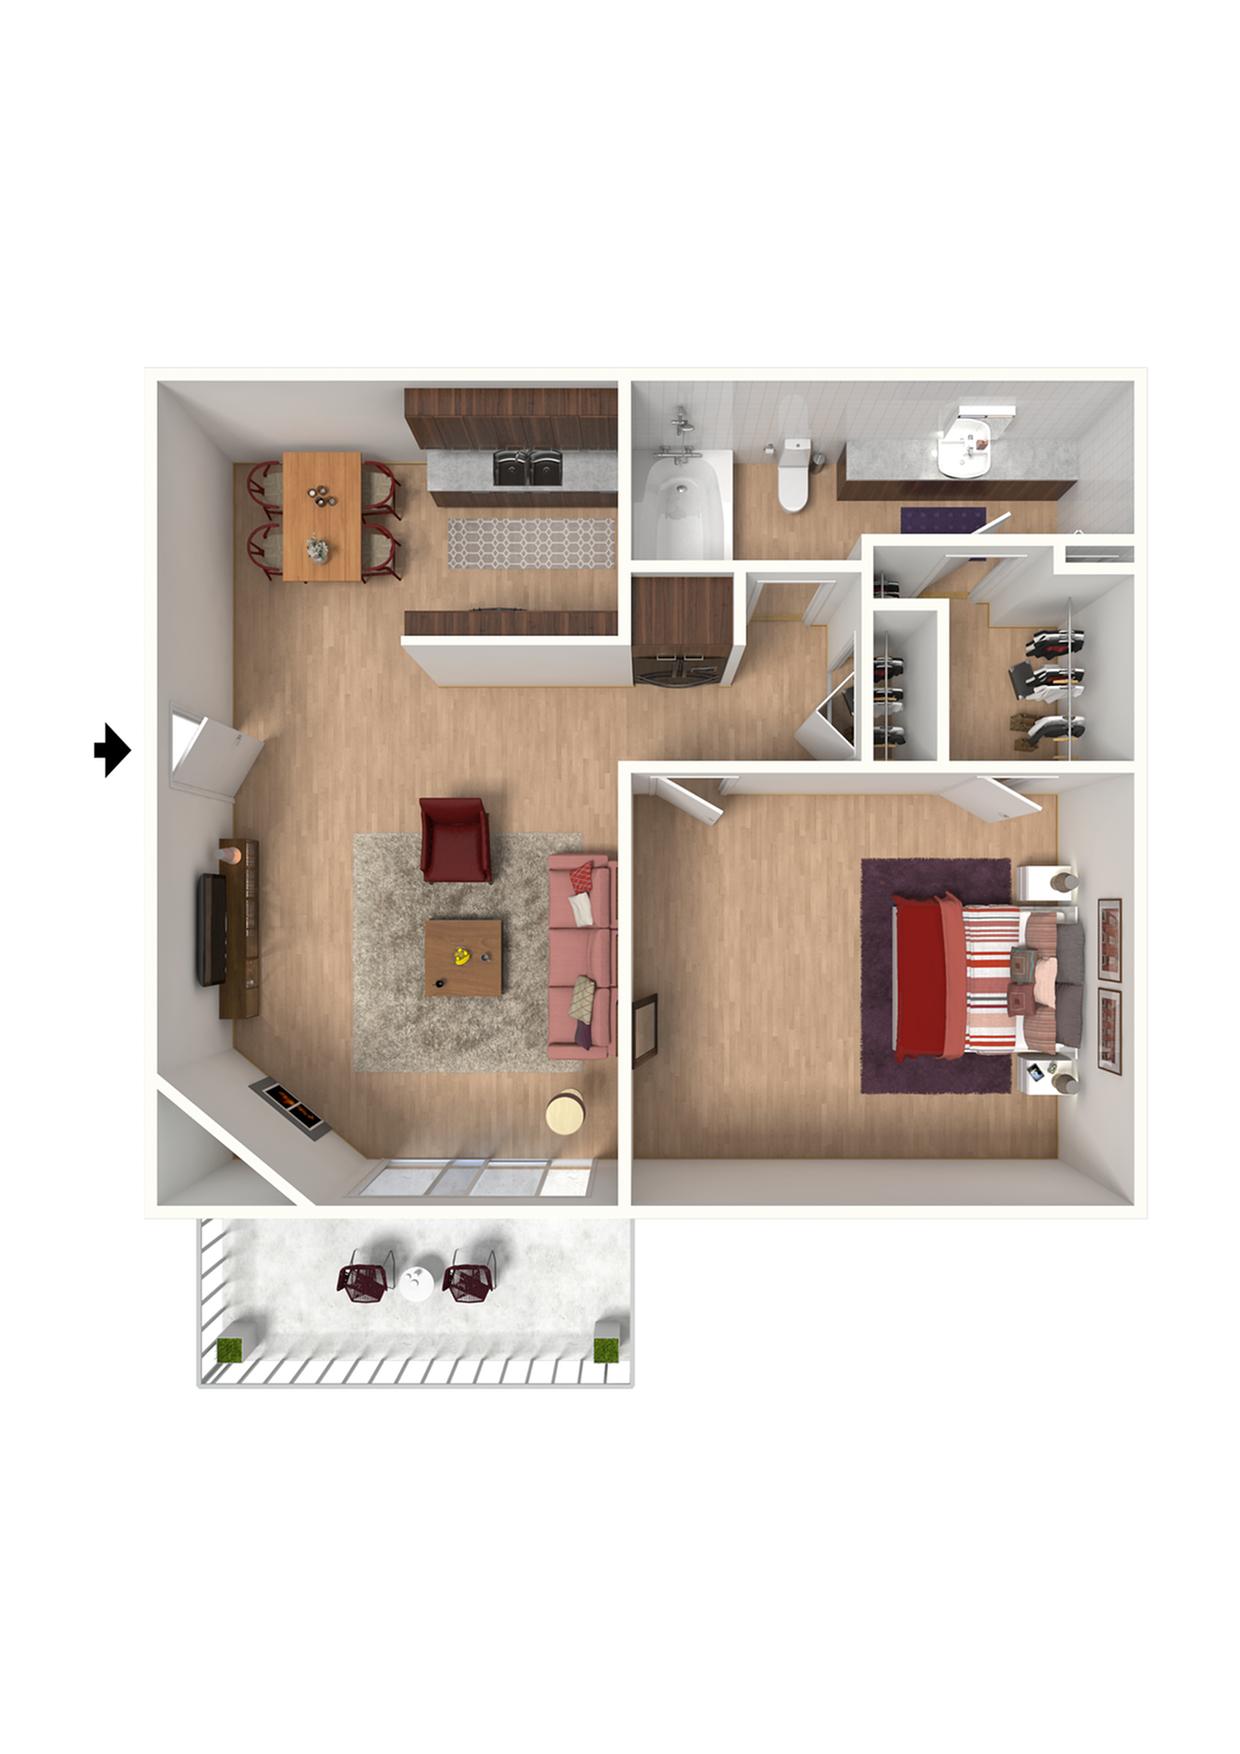 A1 Floorplan: 1 Bedroom, 1 Bathroom - 672 sqft